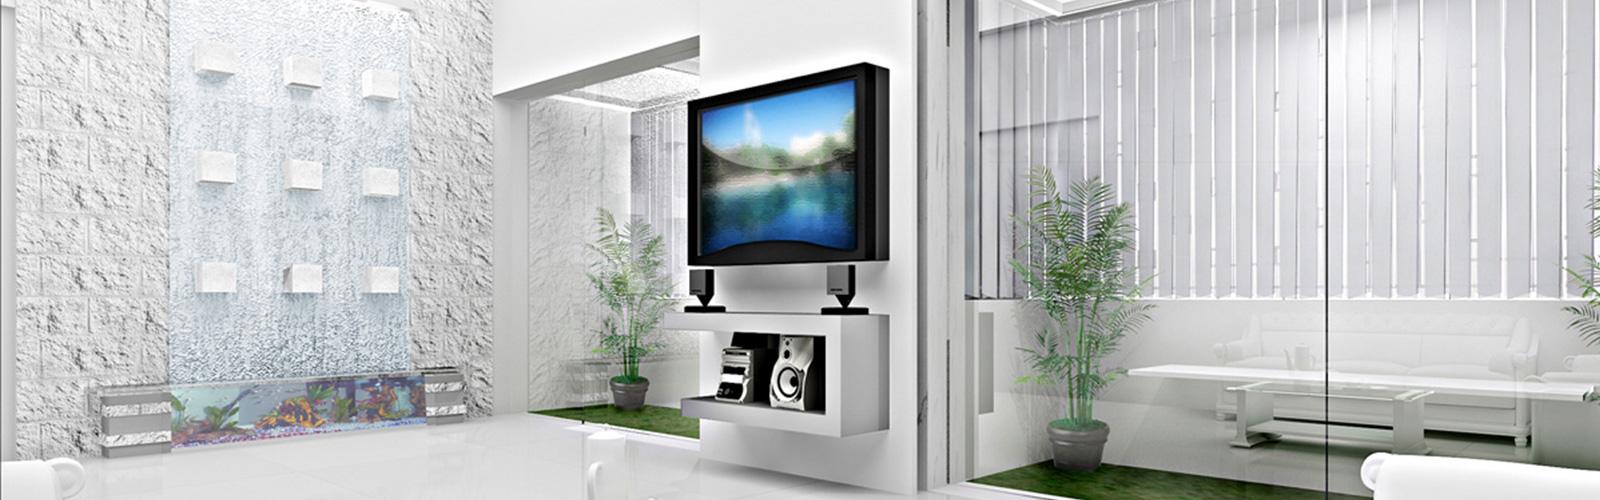 Agence immobili re paris vente location et estimation - Agence specialisee location meublee paris ...